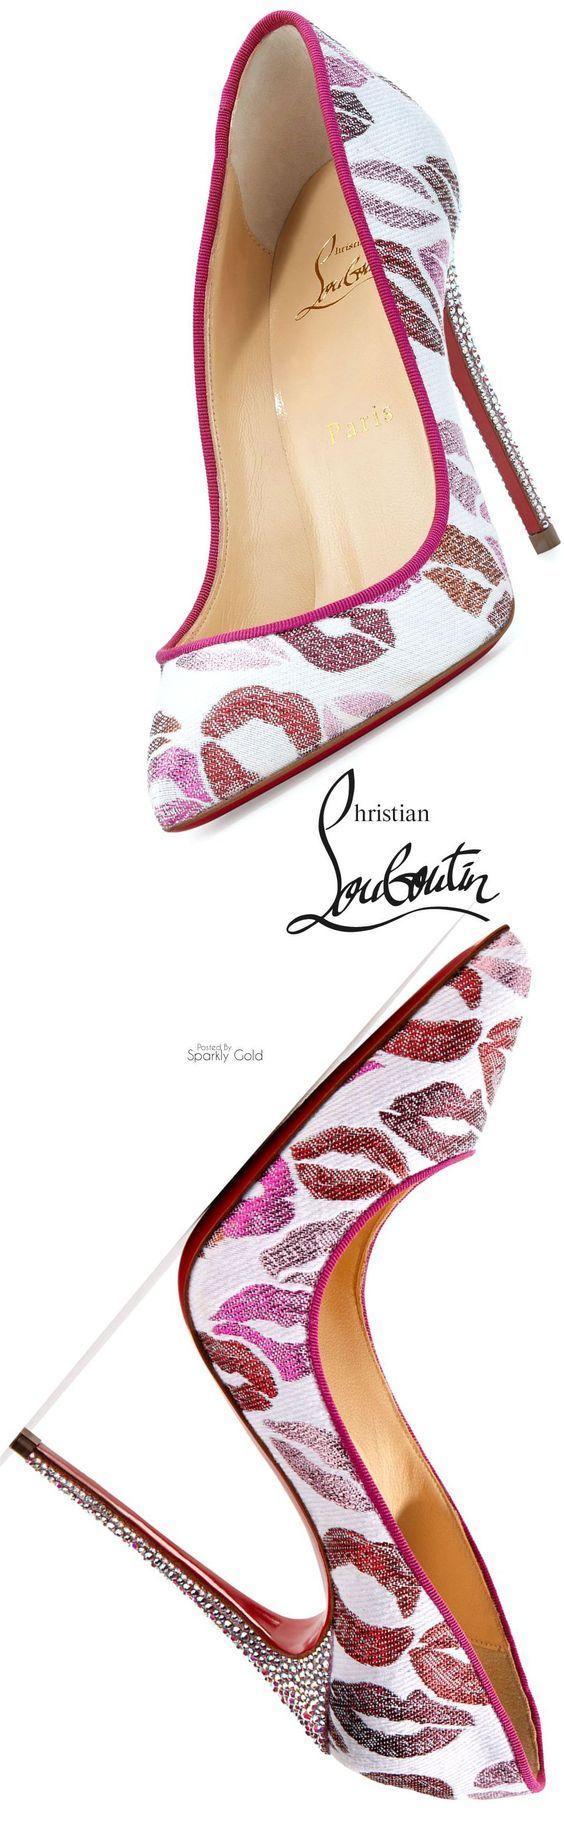 "ultrasparklygold: ""Christian Louboutin """